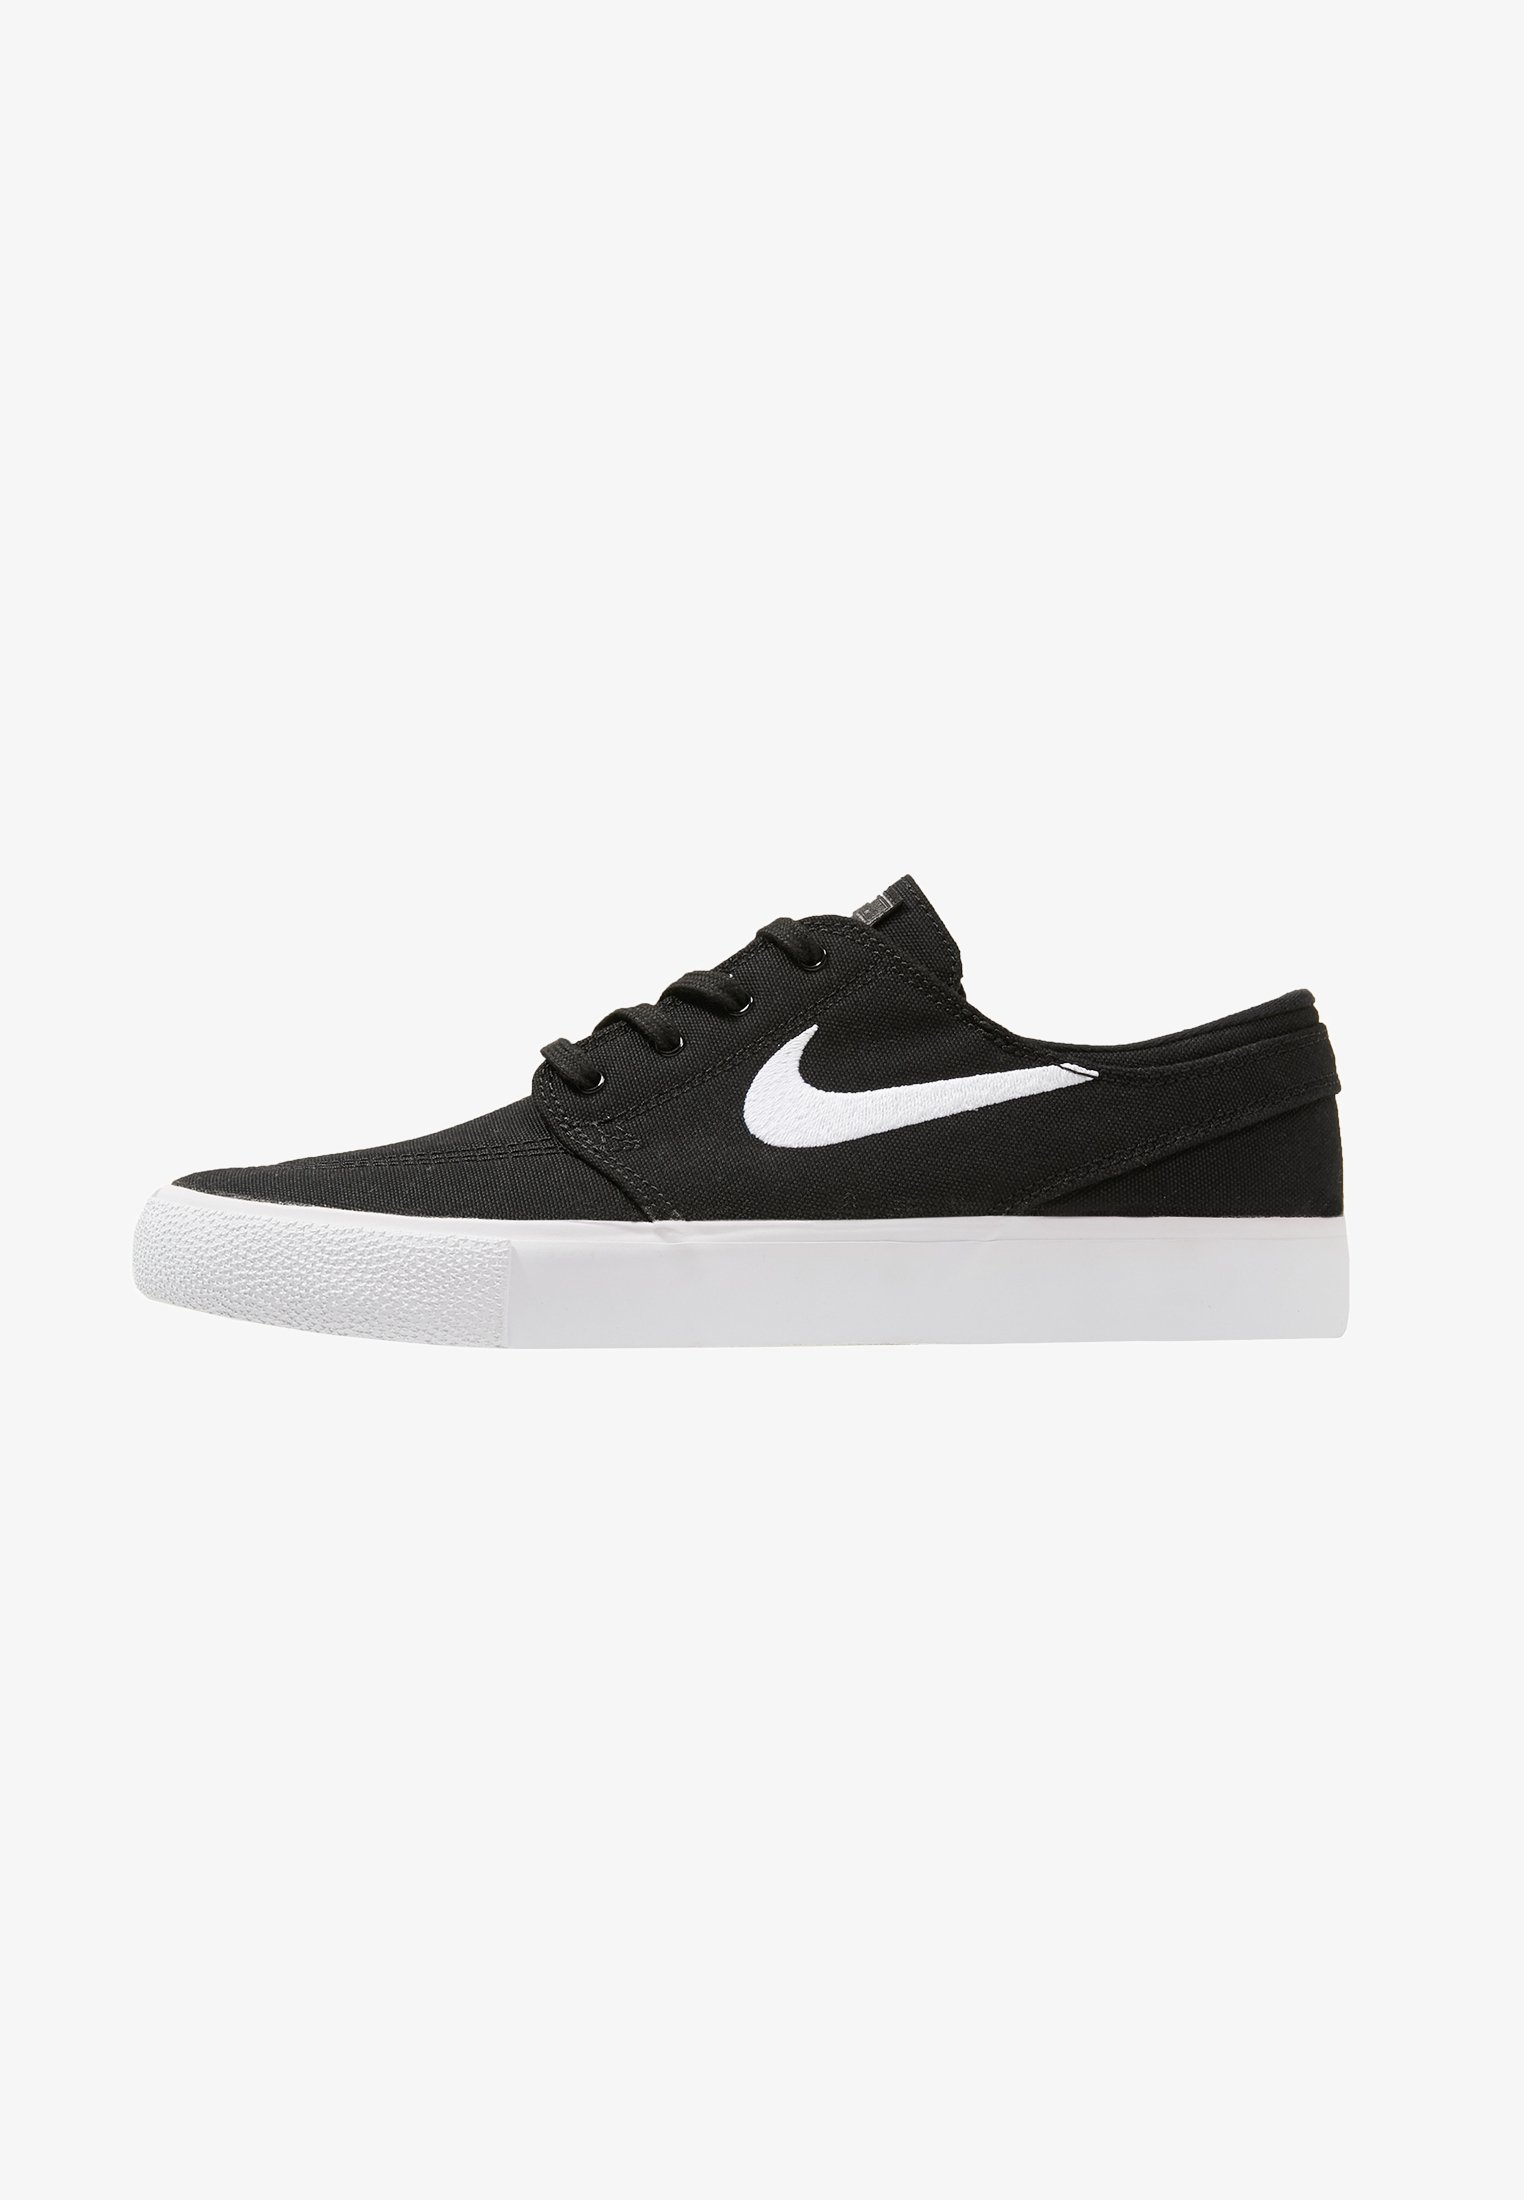 Bocadillo tsunami rodillo  Nike SB ZOOM JANOSKI UNISEX - Zapatillas - black/white/negro - Zalando.es